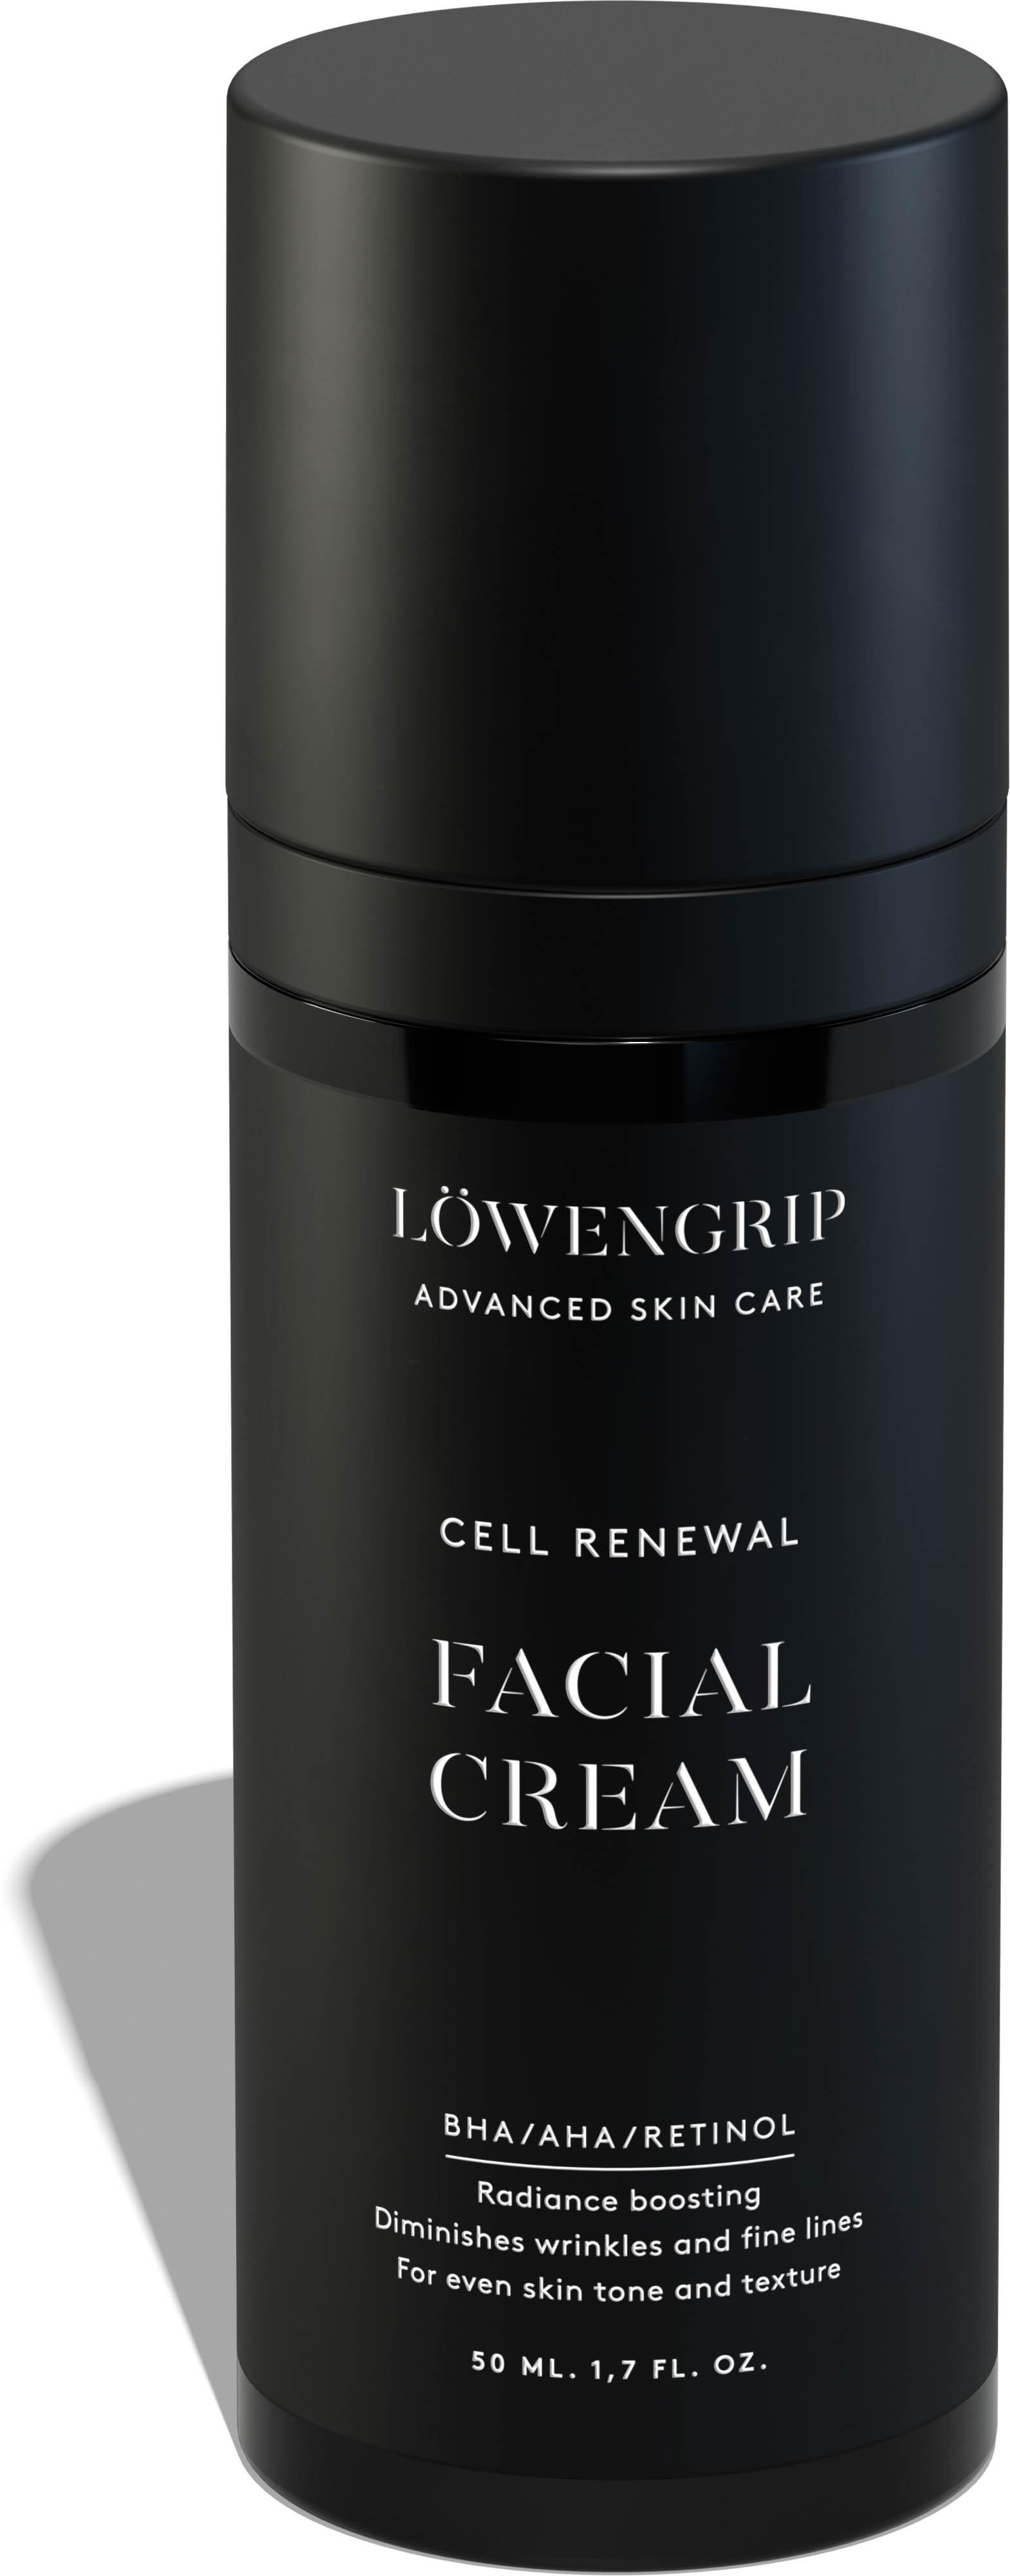 Advanced Skin Care - Cell Renewal Facial Cream 50ml